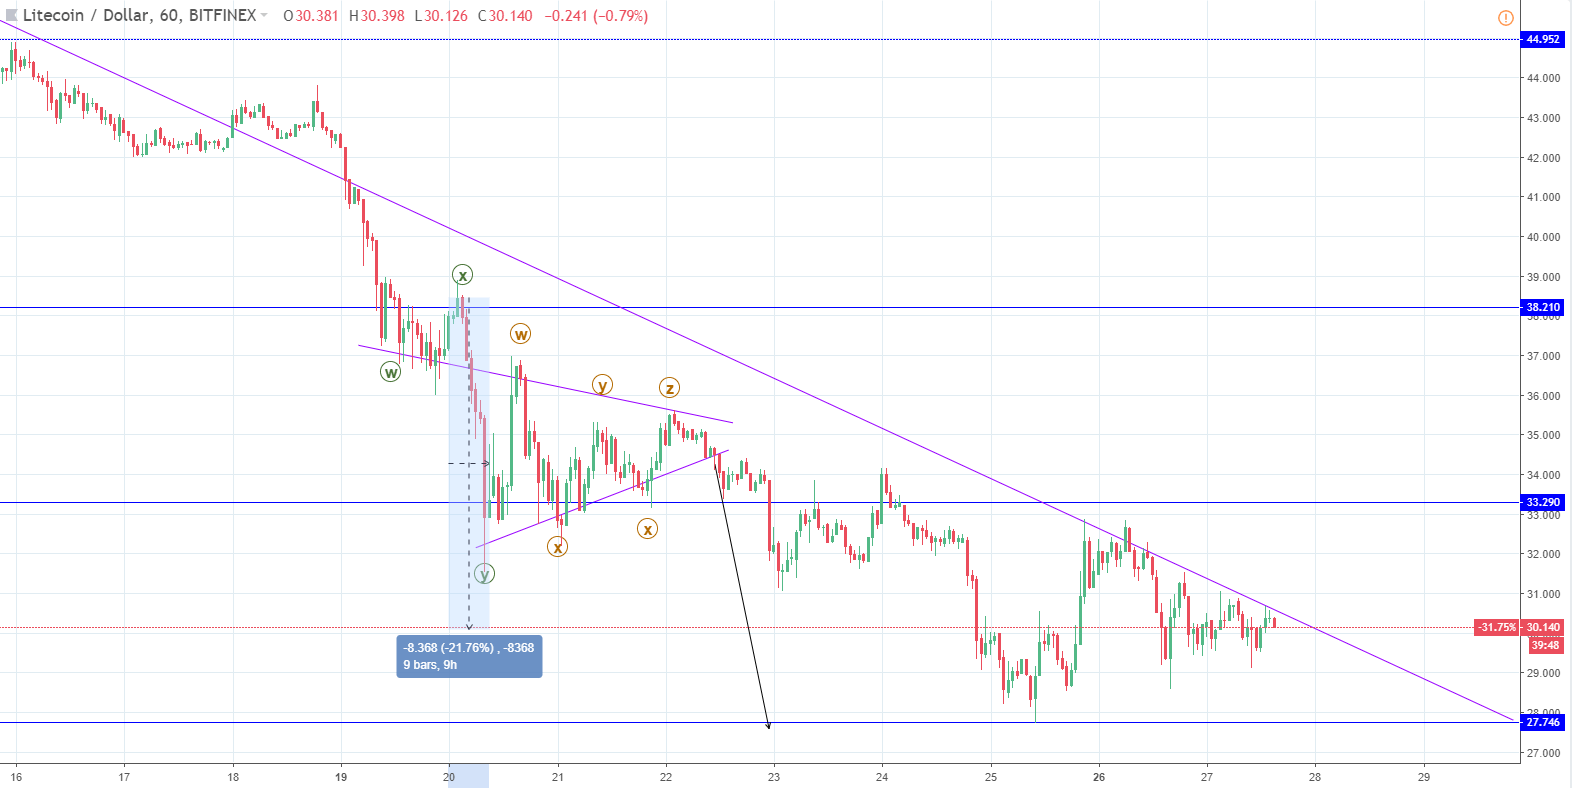 LTC/USD chart - FXOpen